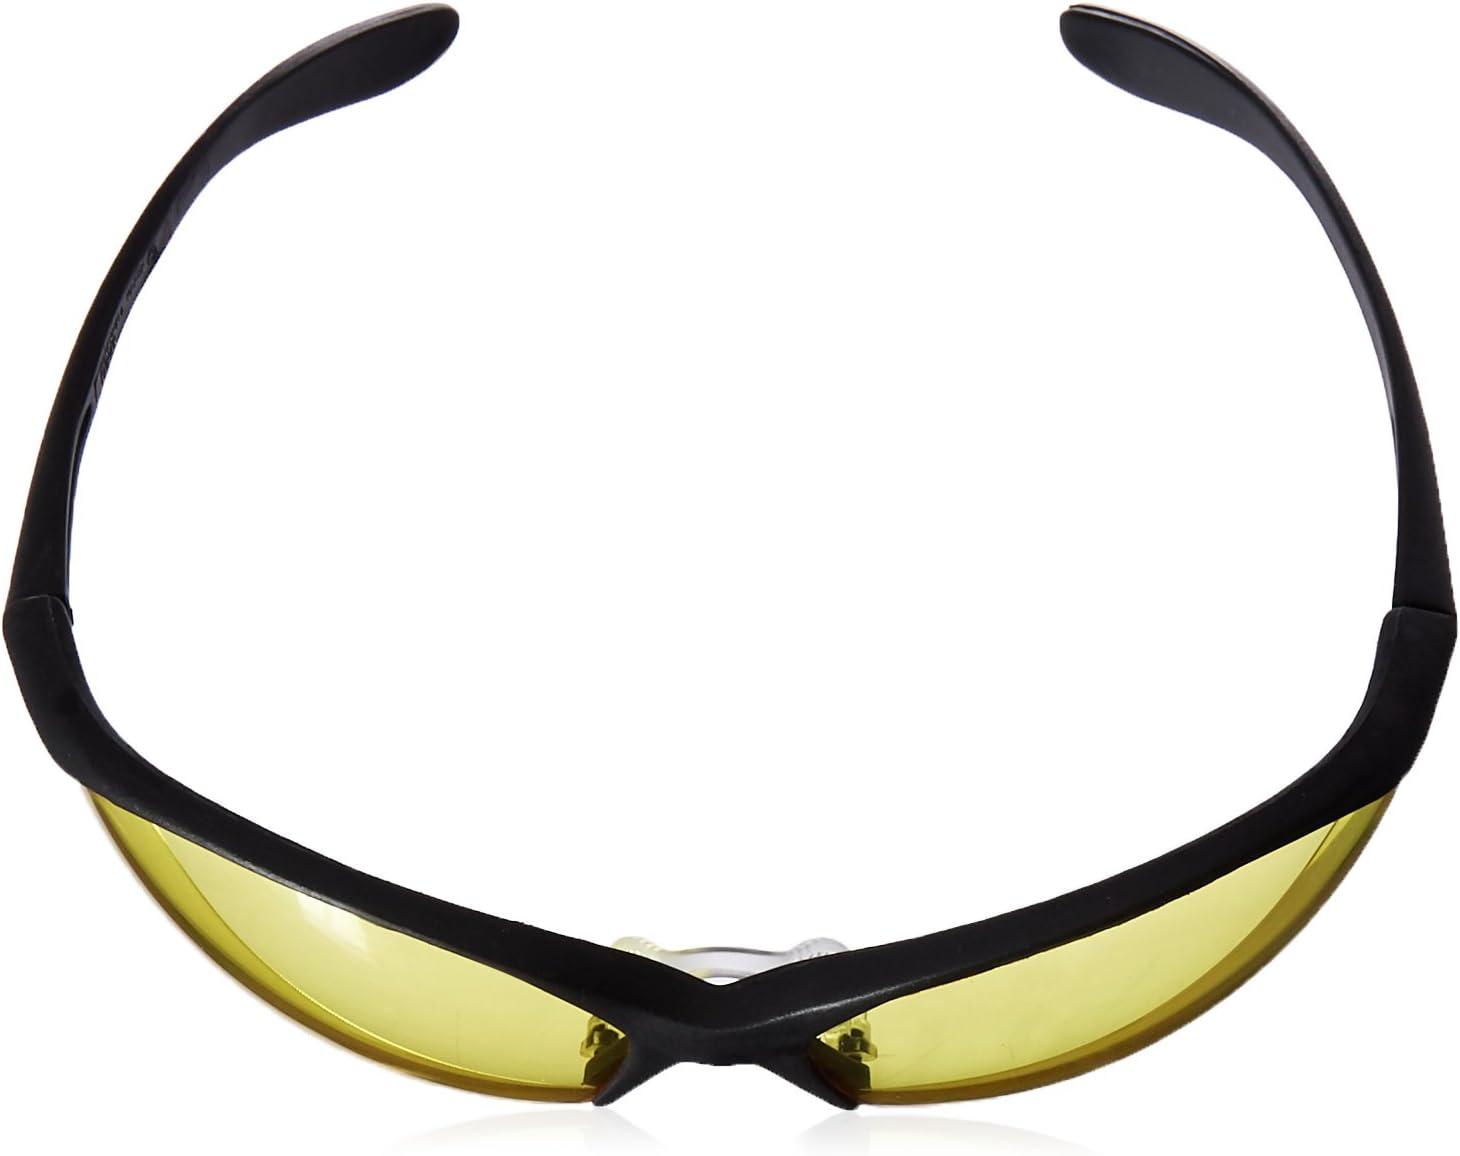 Howard Leight by Honeywell Vapor II Sharp-Shooter Anti-Glare Shooting Glasses, Amber Lens (R-01536) - Ear Protection Equipment -